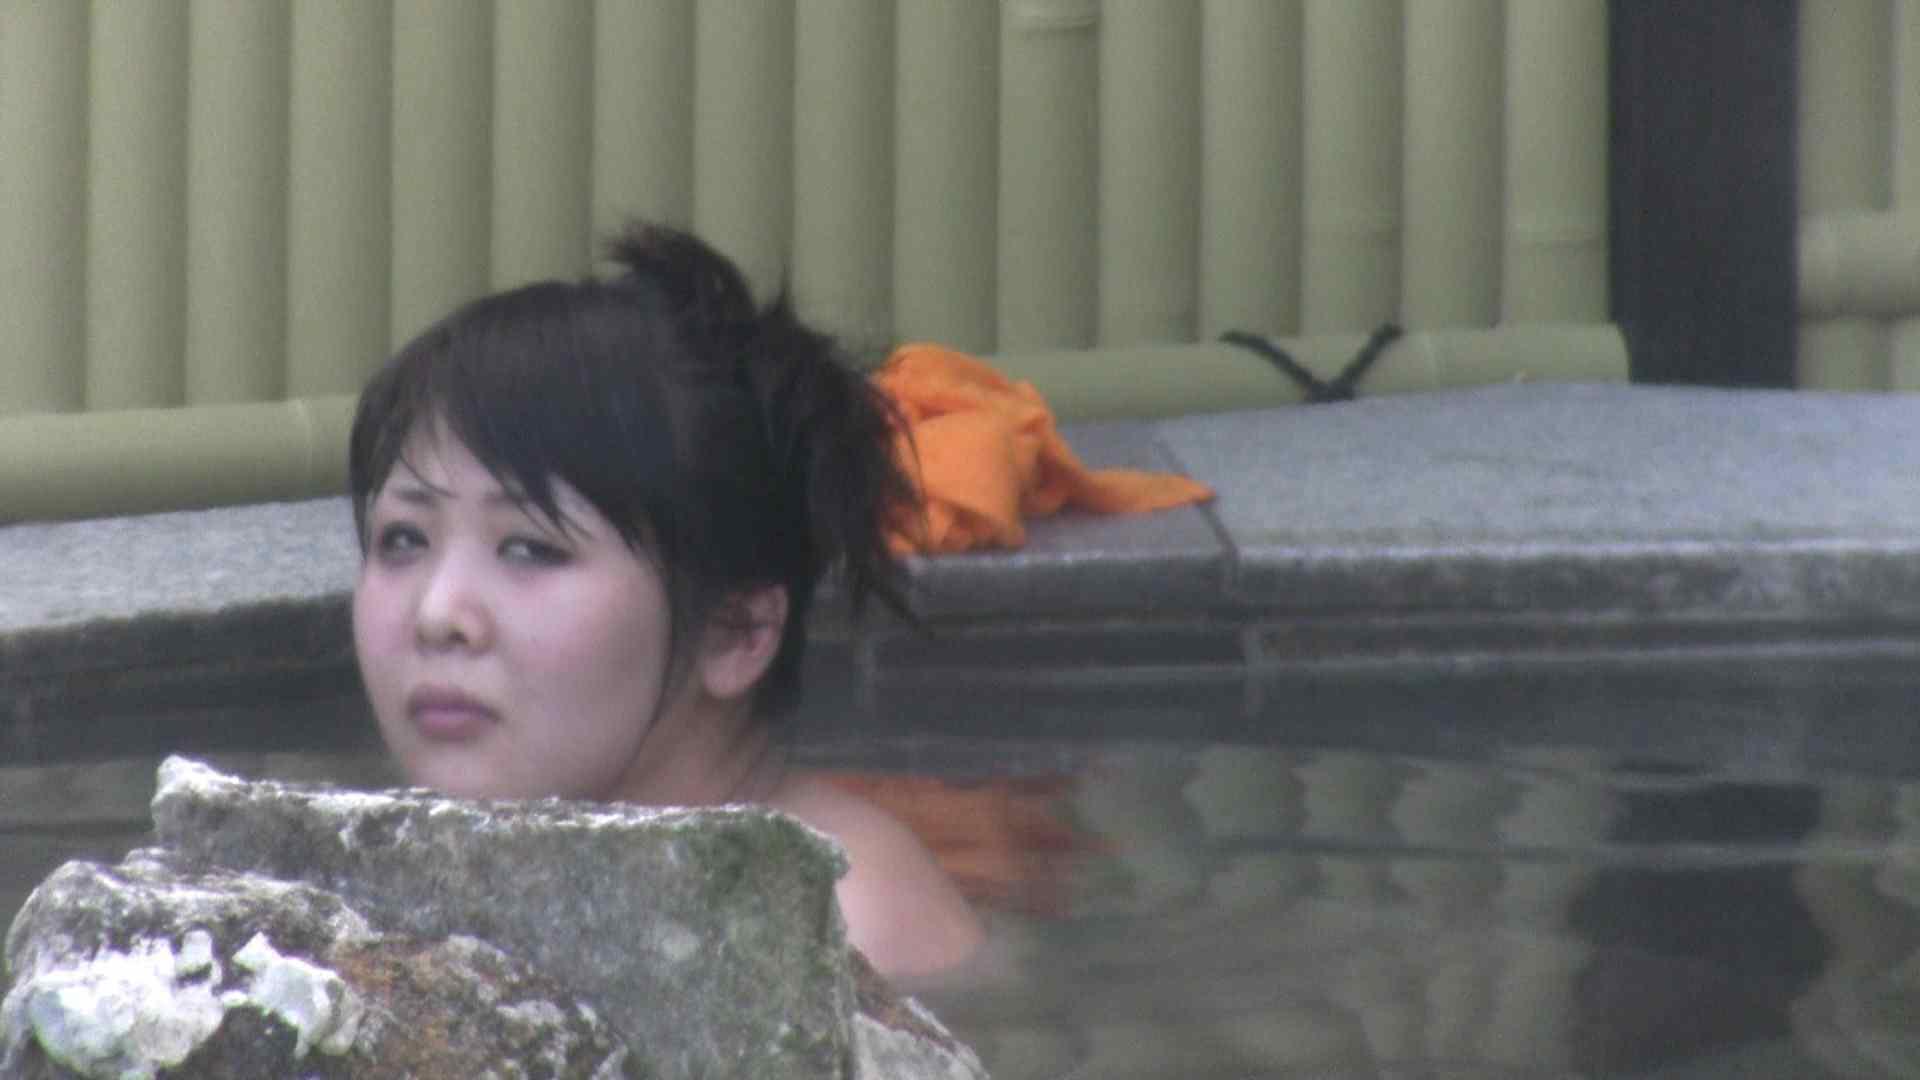 Aquaな露天風呂Vol.118 OL女体  68連発 39